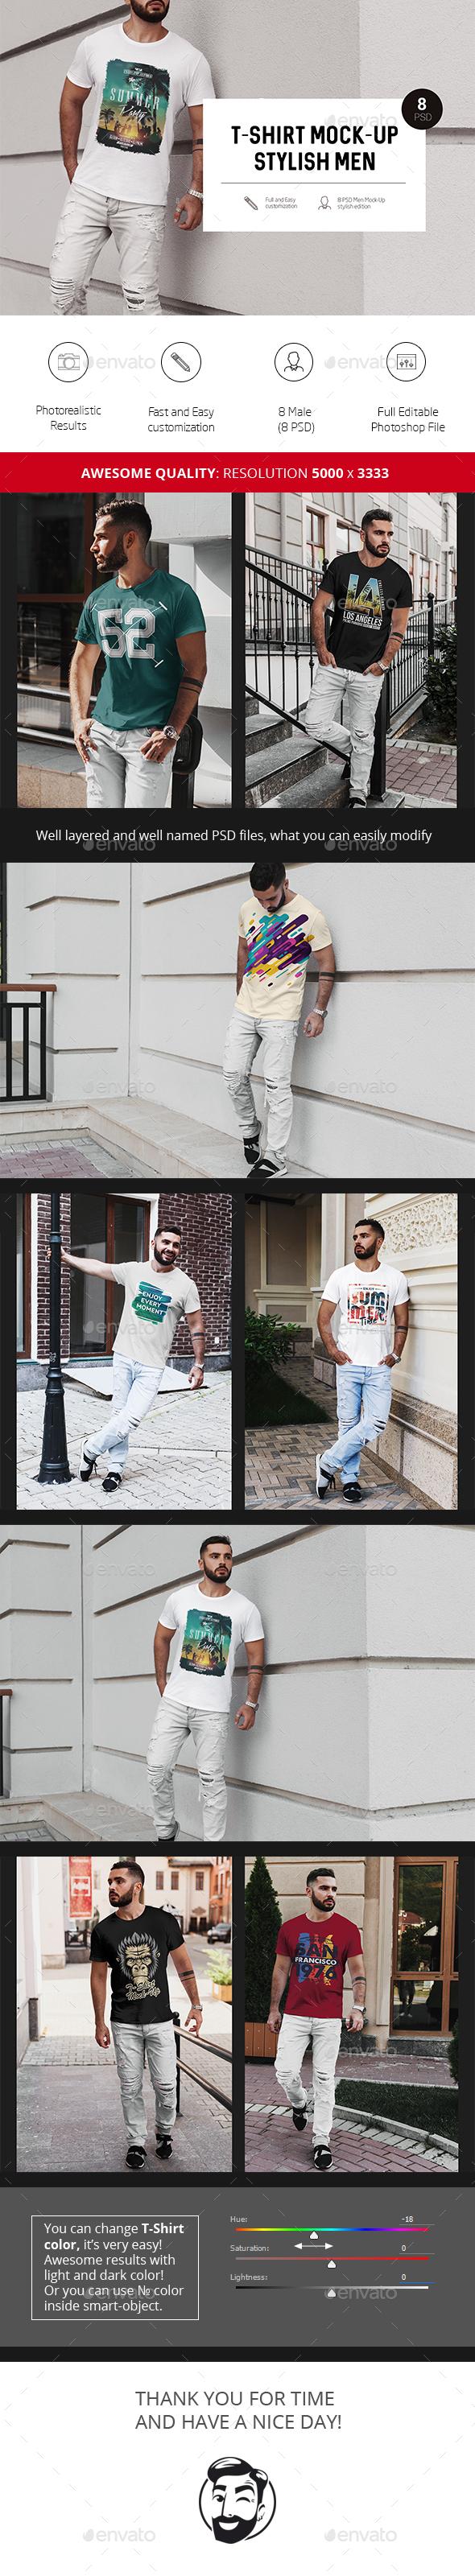 T-Shirt Mock-Up Stylish Men - Product Mock-Ups Graphics